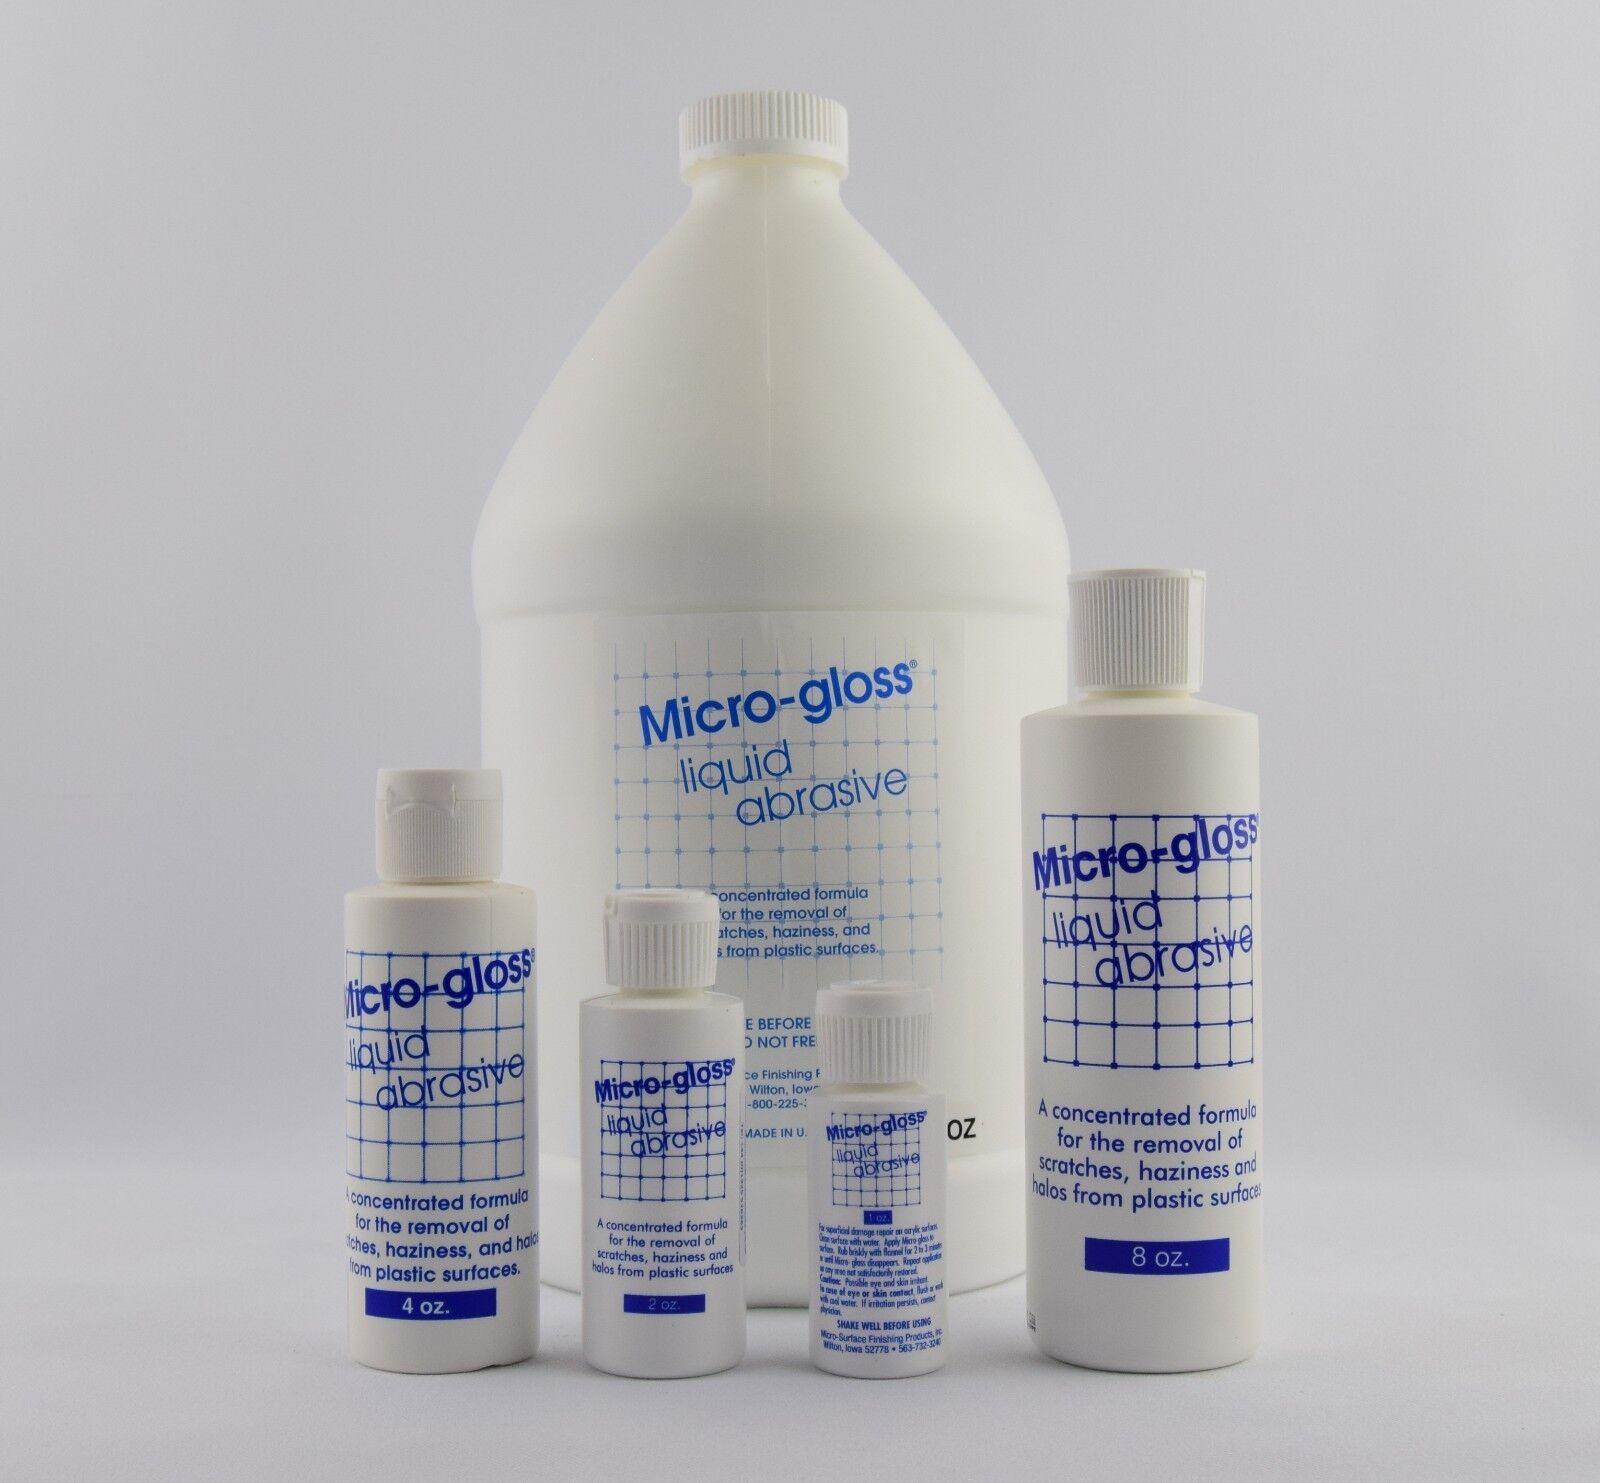 MICRO-GLOSS LIQUIDE abrasif - 1 oz (environ 56.70 28.35 g), 2 oz (environ 56.70 (environ g), 8 oz (environ 226.79 g) bouteilles disponibles c17af0